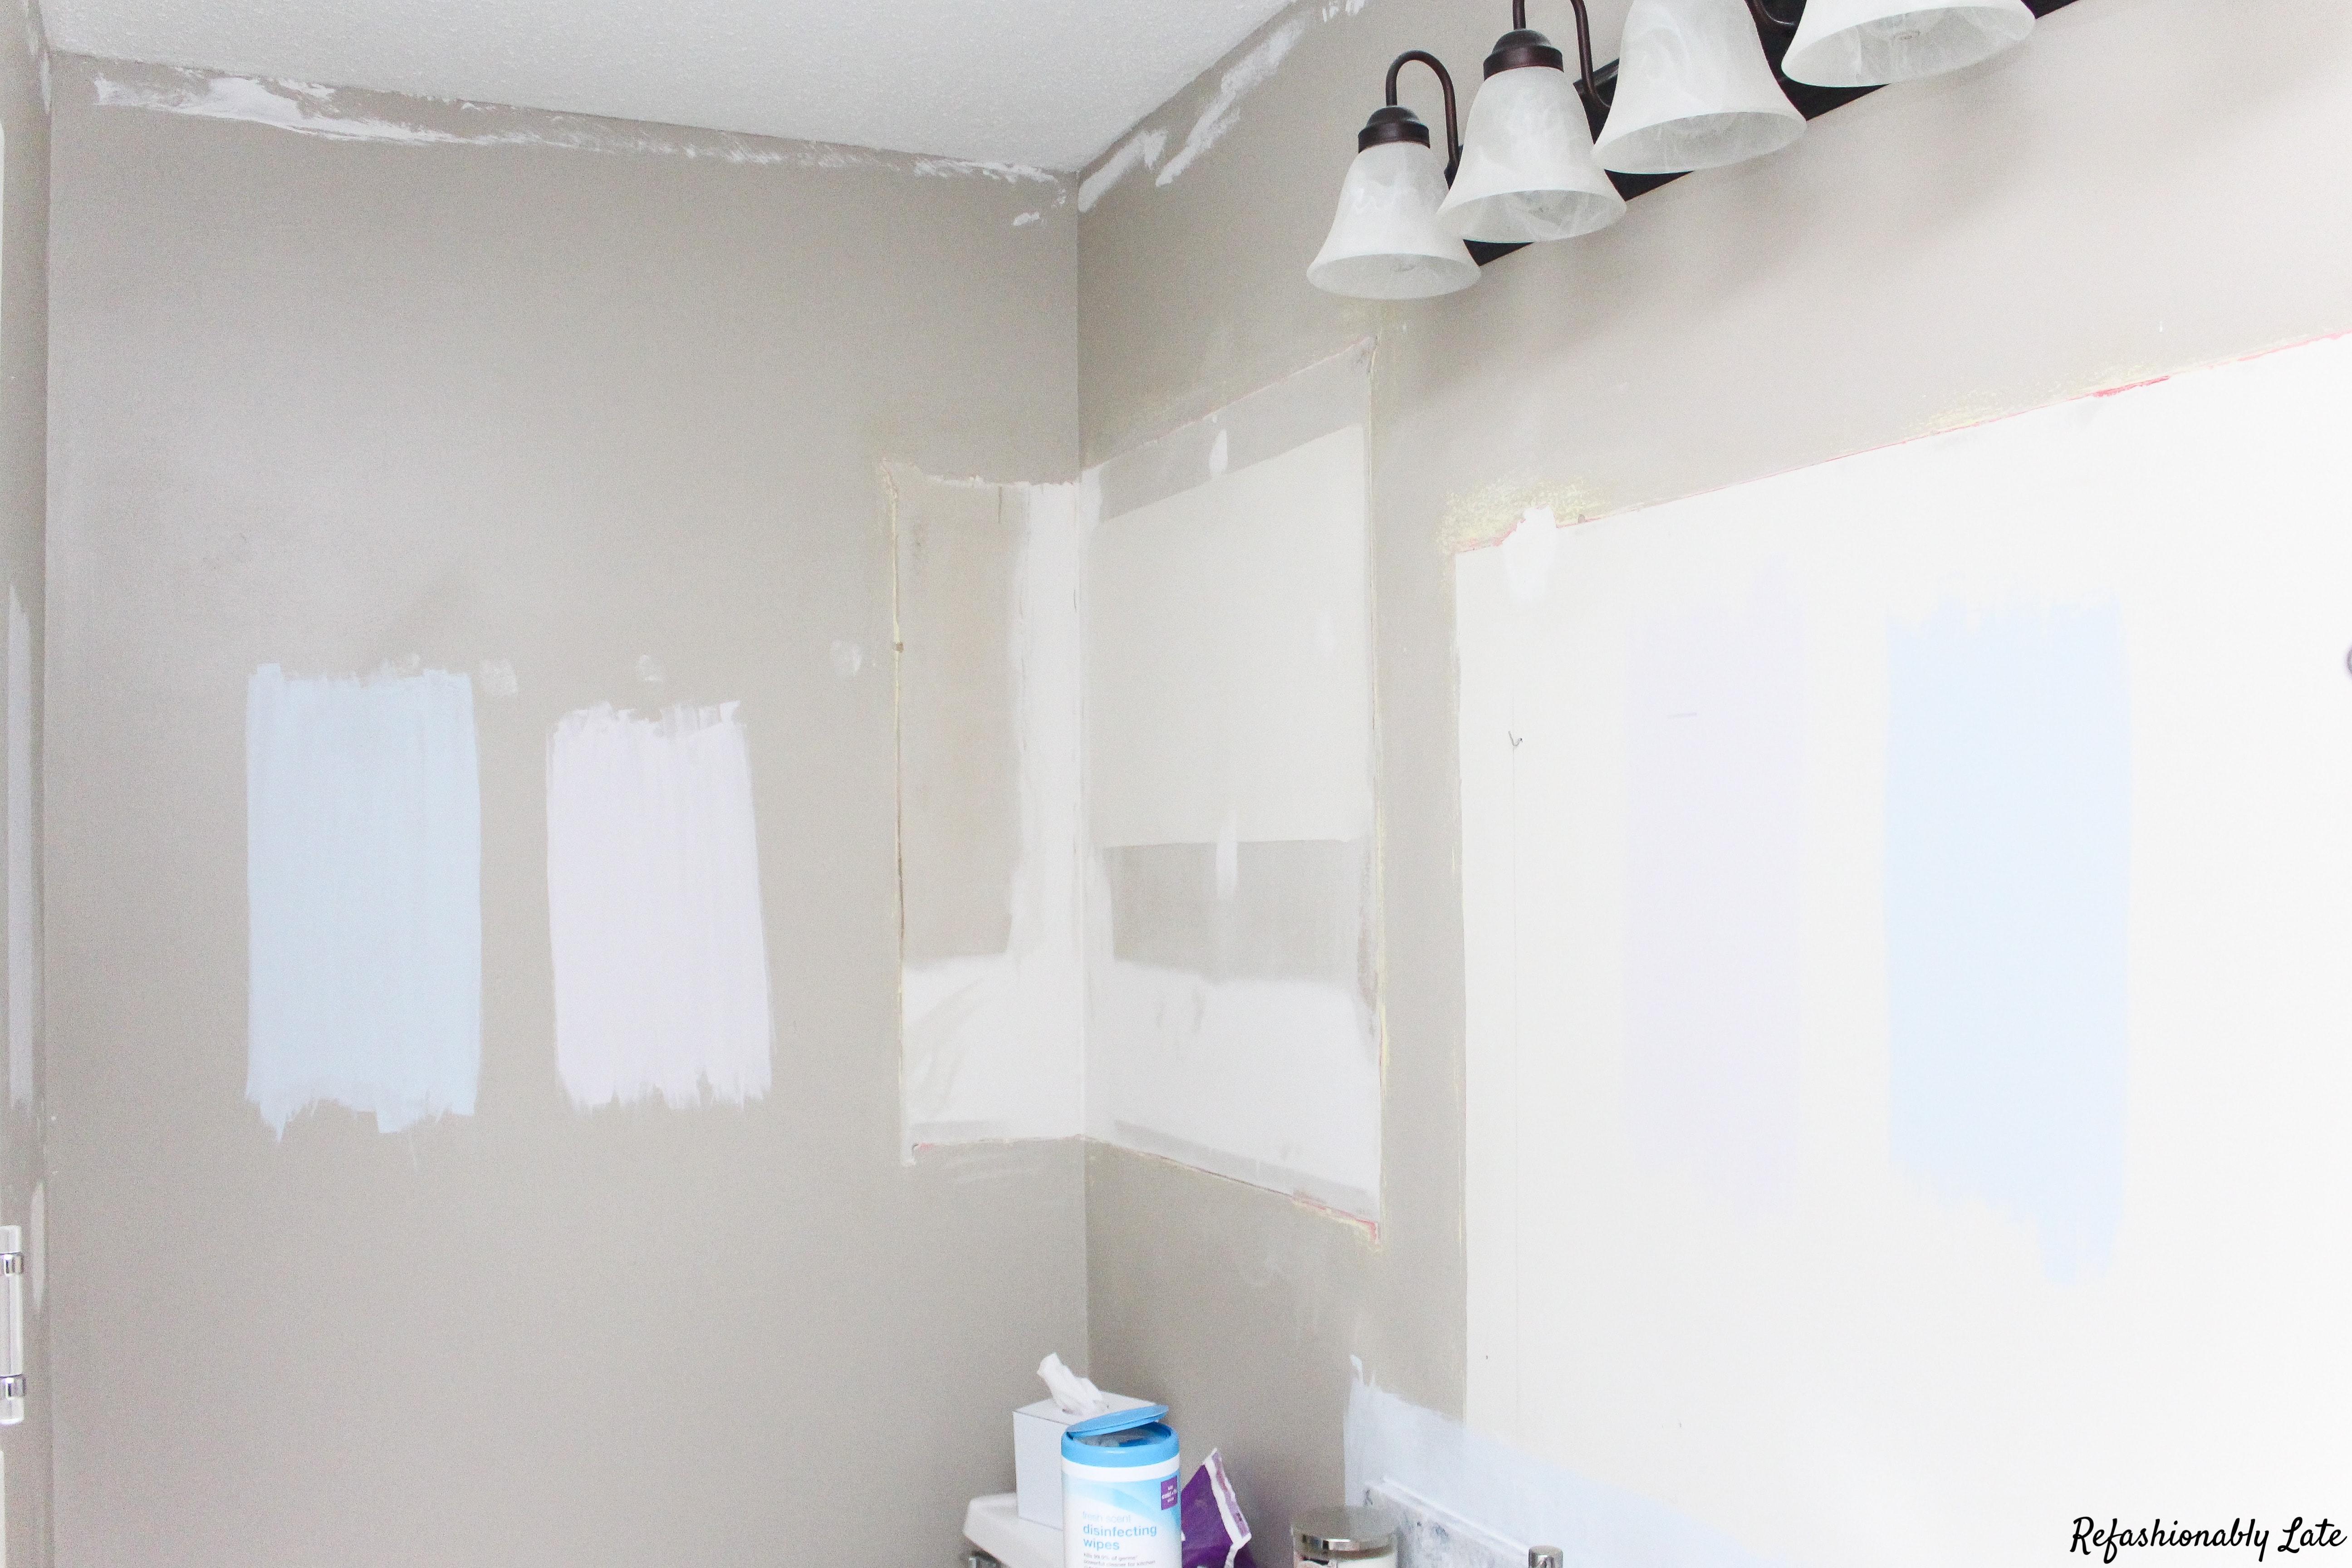 One Room Challenge Week 2 Bathroom Progress - www.refashionablylate.com